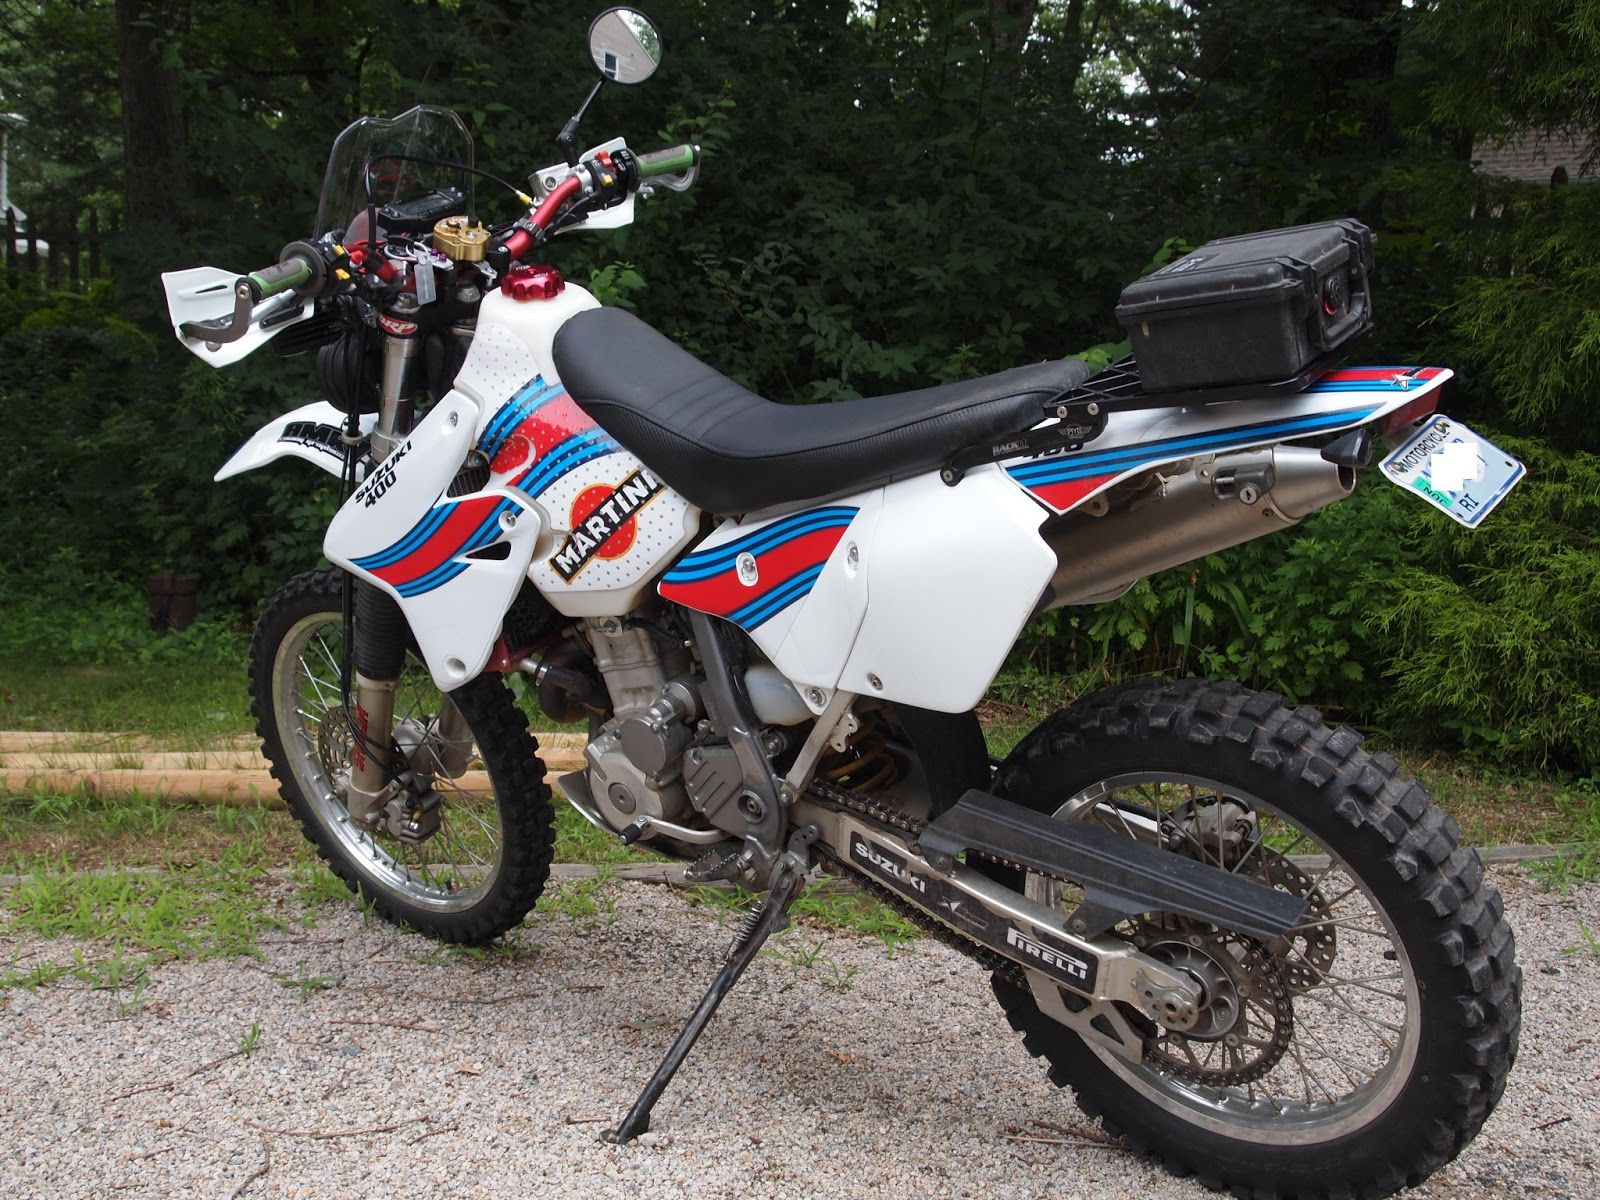 Suzuki Drz 400 Adventure Bike Dual Sport Adventure Motorcycling